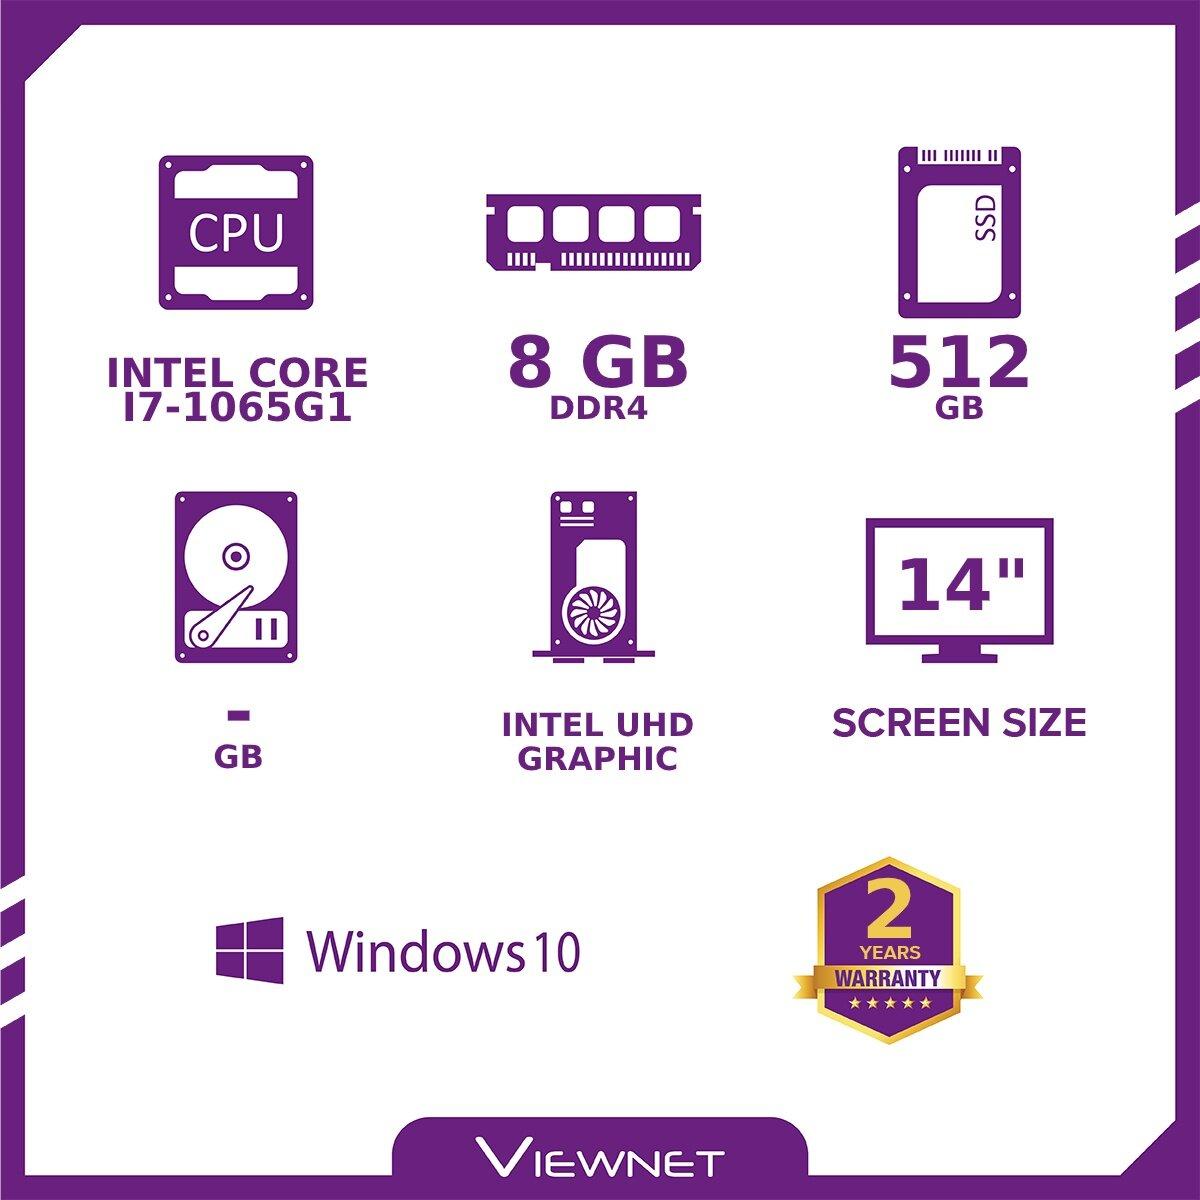 ASUS ZENBOOK 14 UX425J-AB689TS LAPTOP INTEL CORE I7-1065G7 8GB DDR4LP 512GB SSD INTEL HD GRAPHIC W10 14